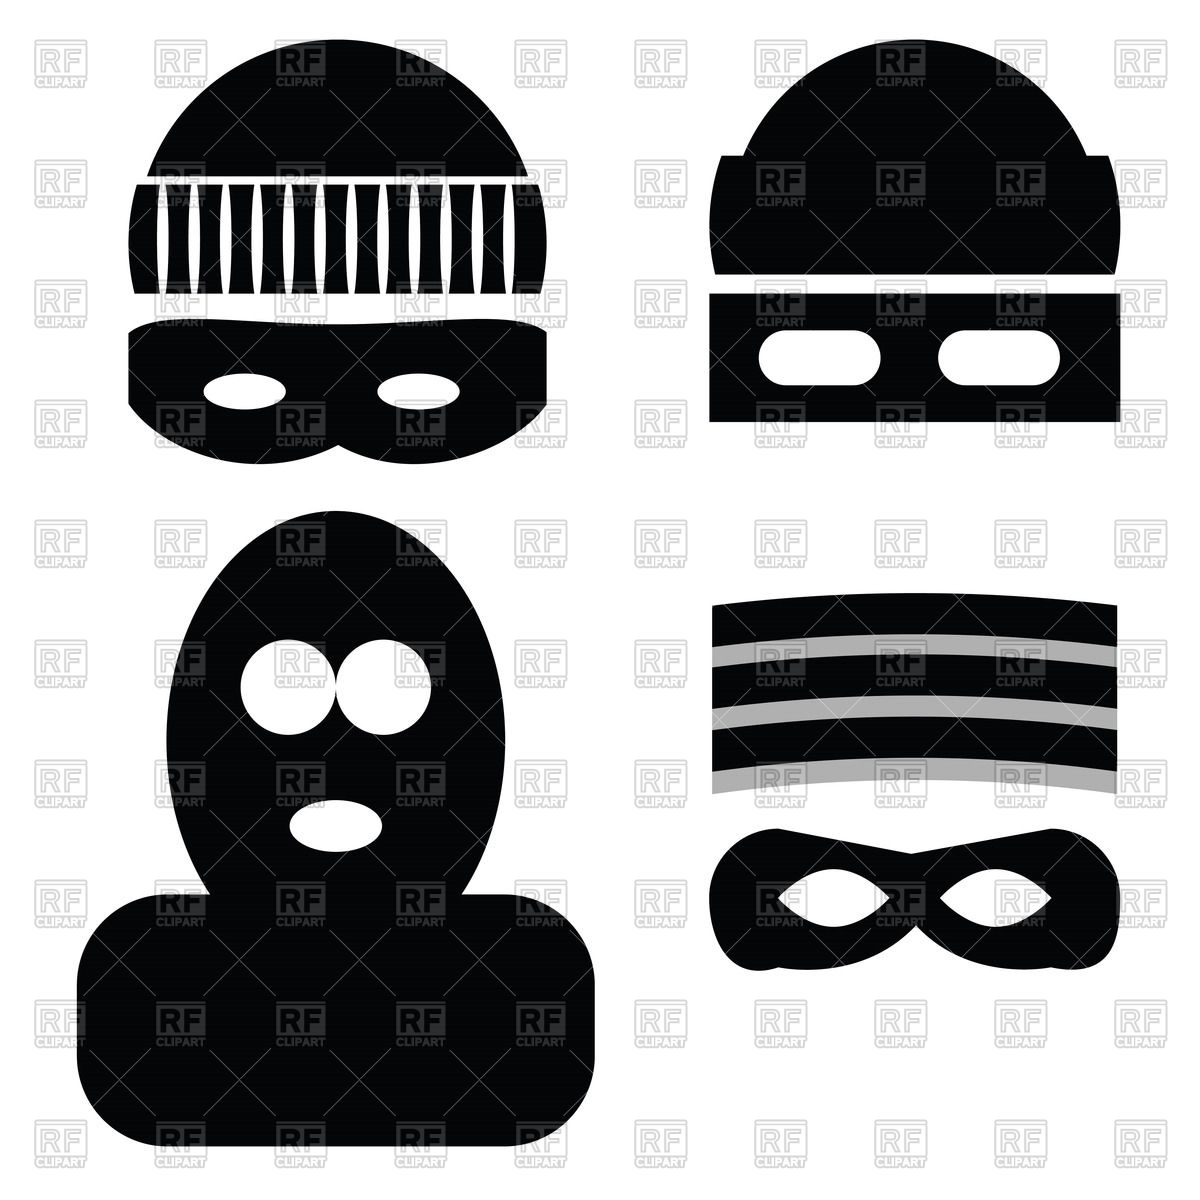 Burglar clipart old fashioned. Enchanting mask template image